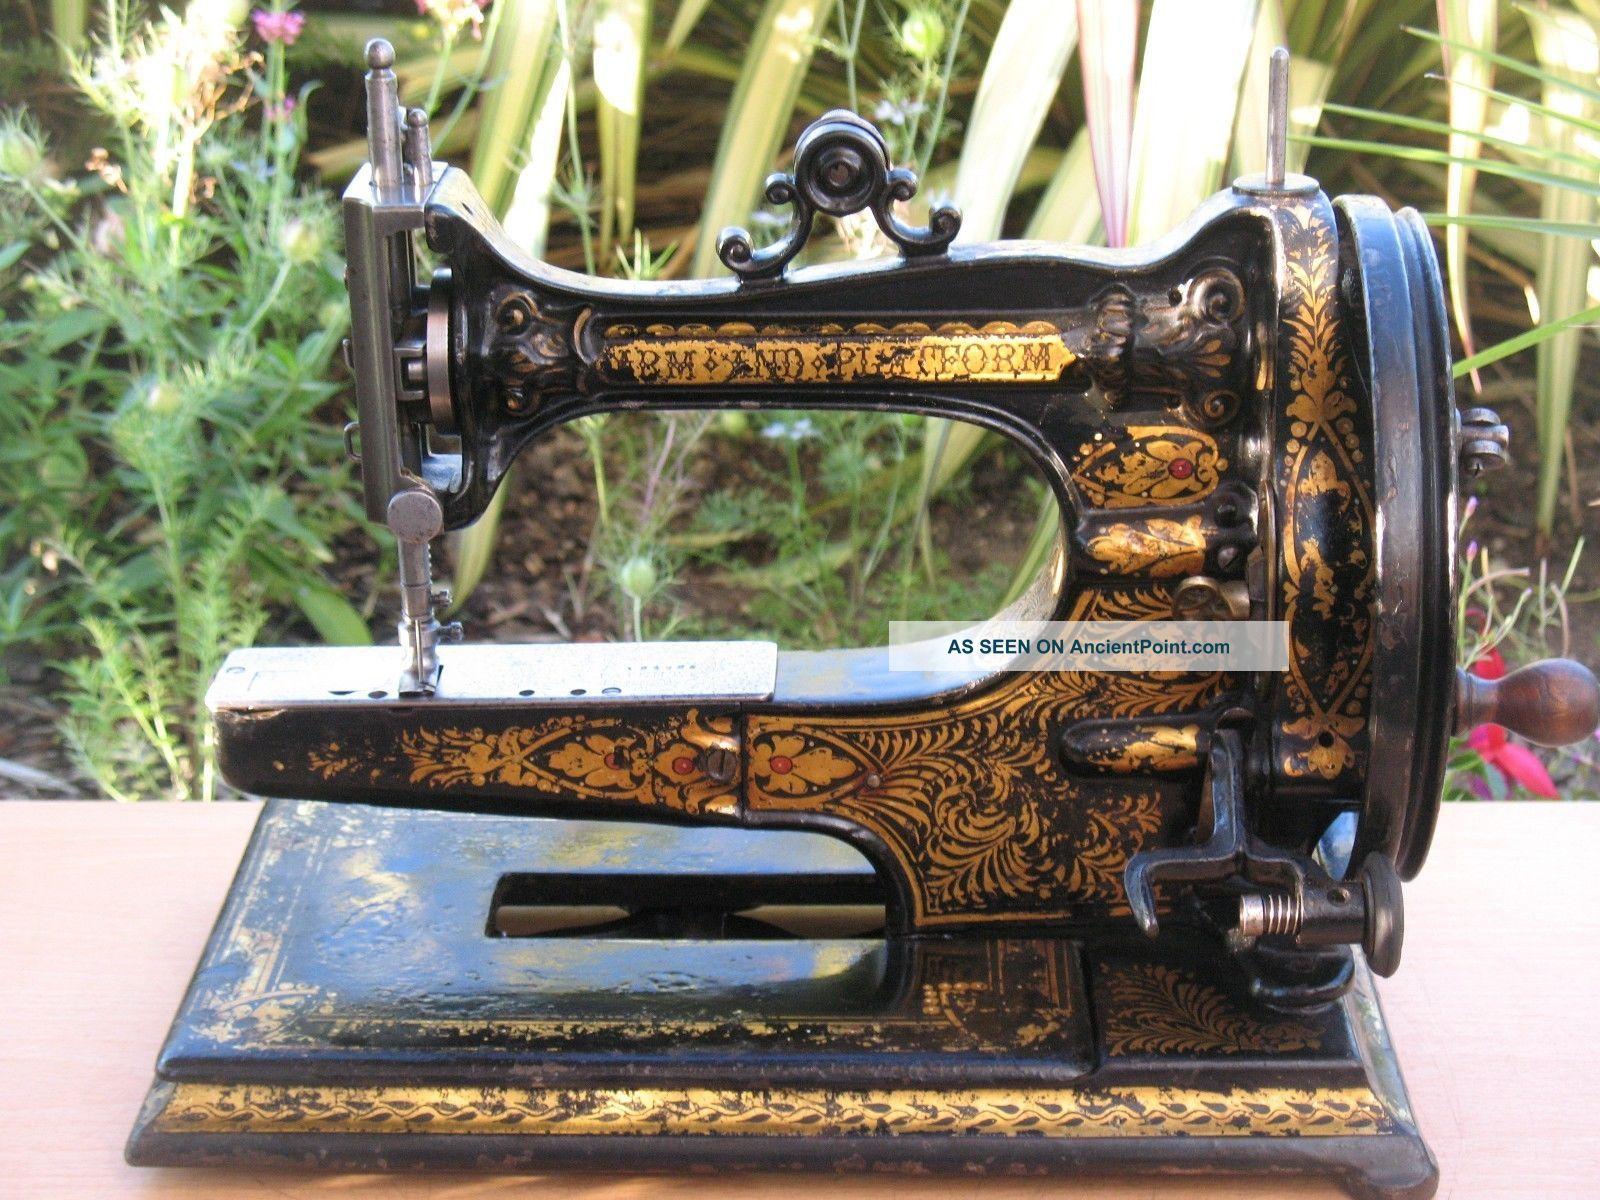 Rare Antique 1875 Edward Ward Arm & Platform Sewing Machine Sewing Machines photo